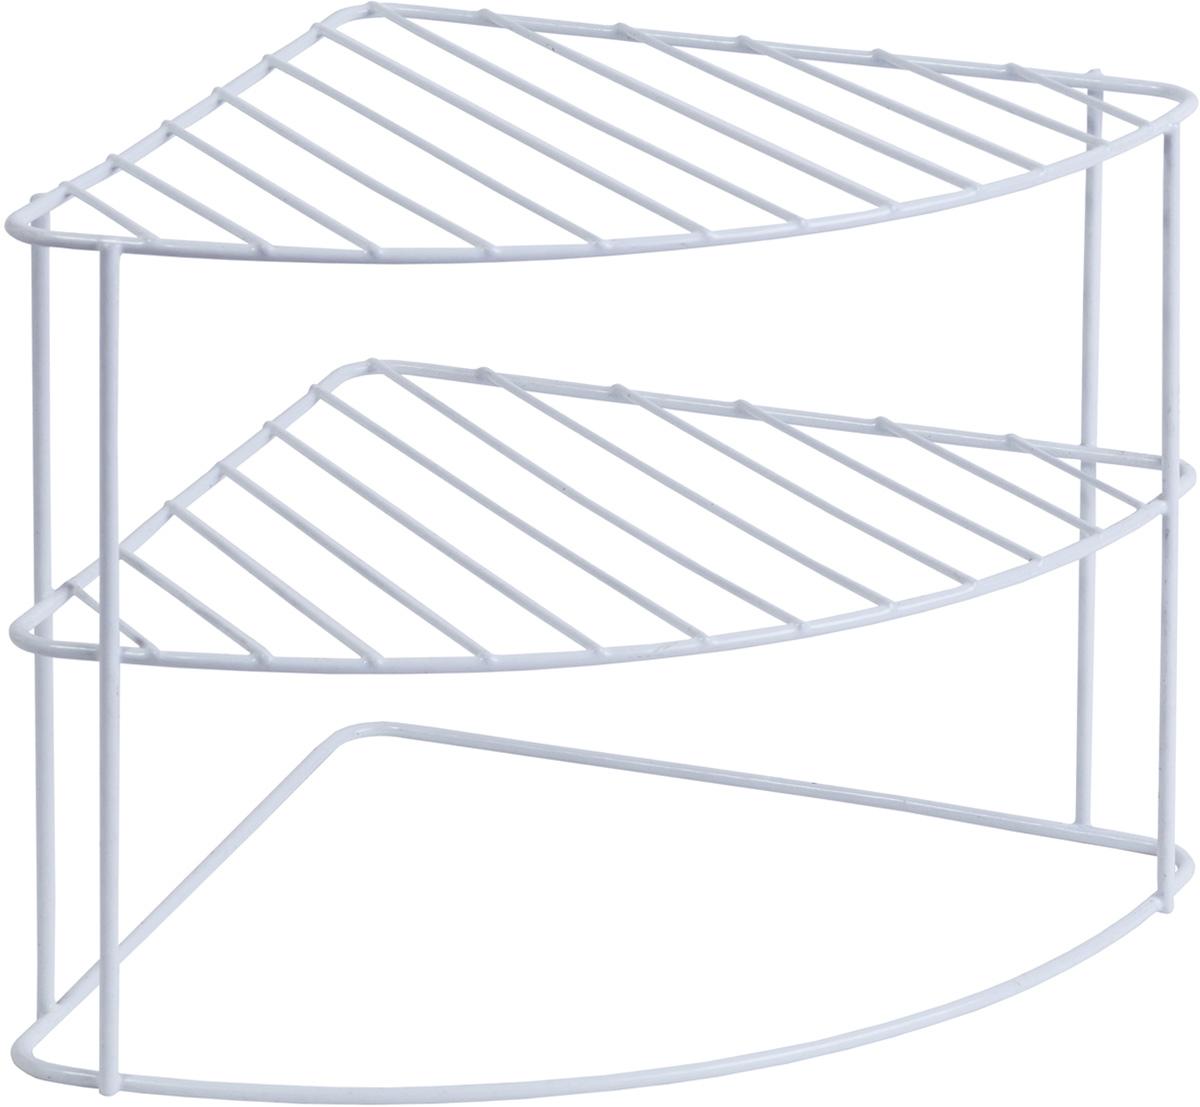 Полка-органайзер Tatkraft Level, трехуровневая, угловая, 23 х 22 х 23 см полка metaltex onda safe fix 2 уровневая угловая цвет серый 22 х 22 х 35 см